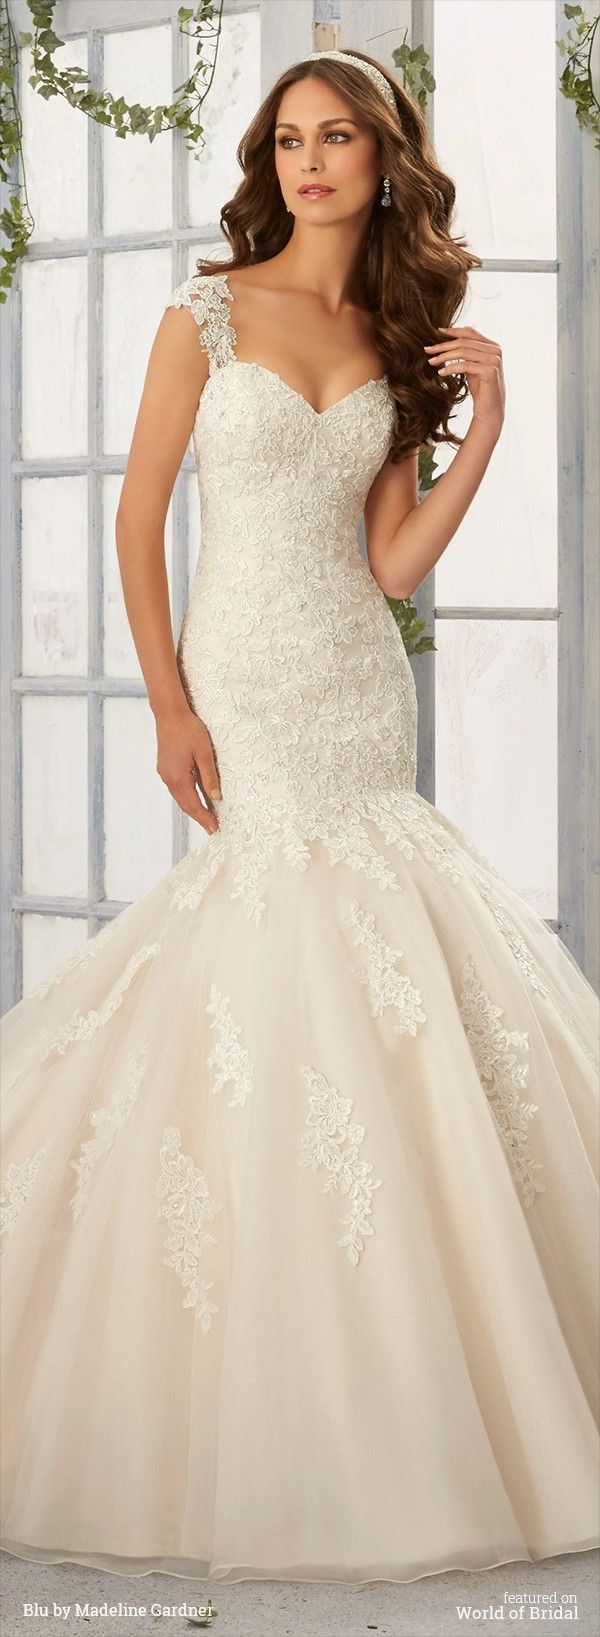 Mermaid Wedding Dresses : Alencon Lace Appliques with ...